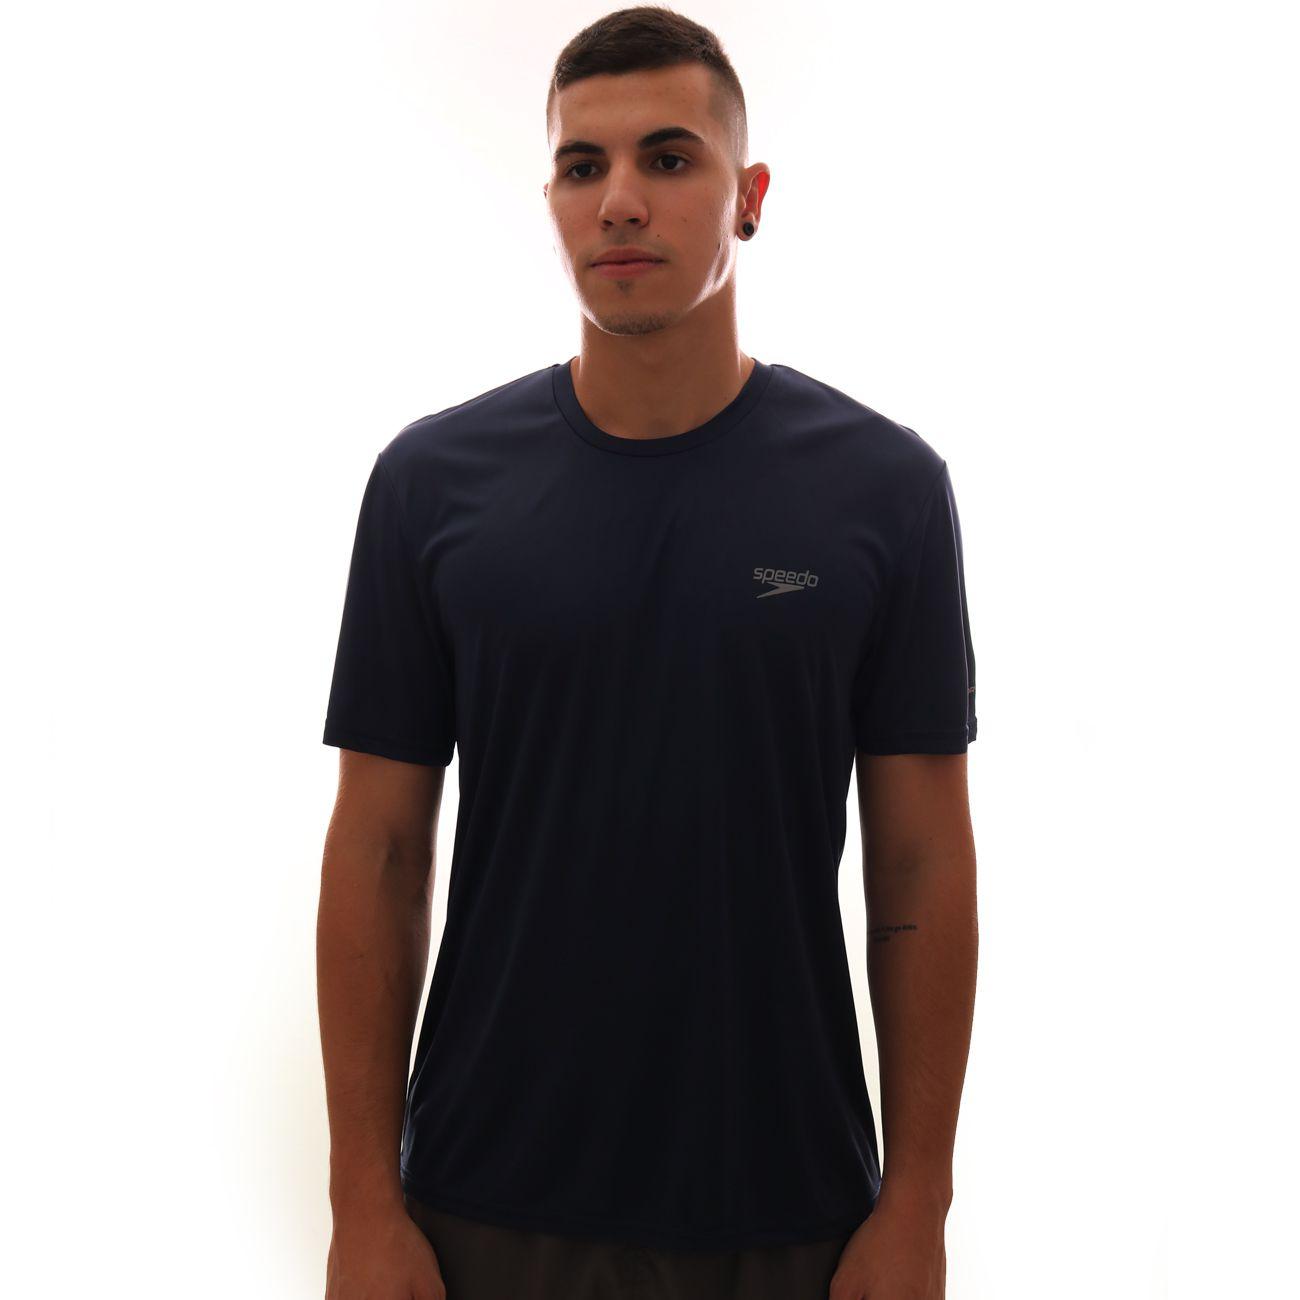 Camiseta Speedo Interlock UV50 Masculina Marinho